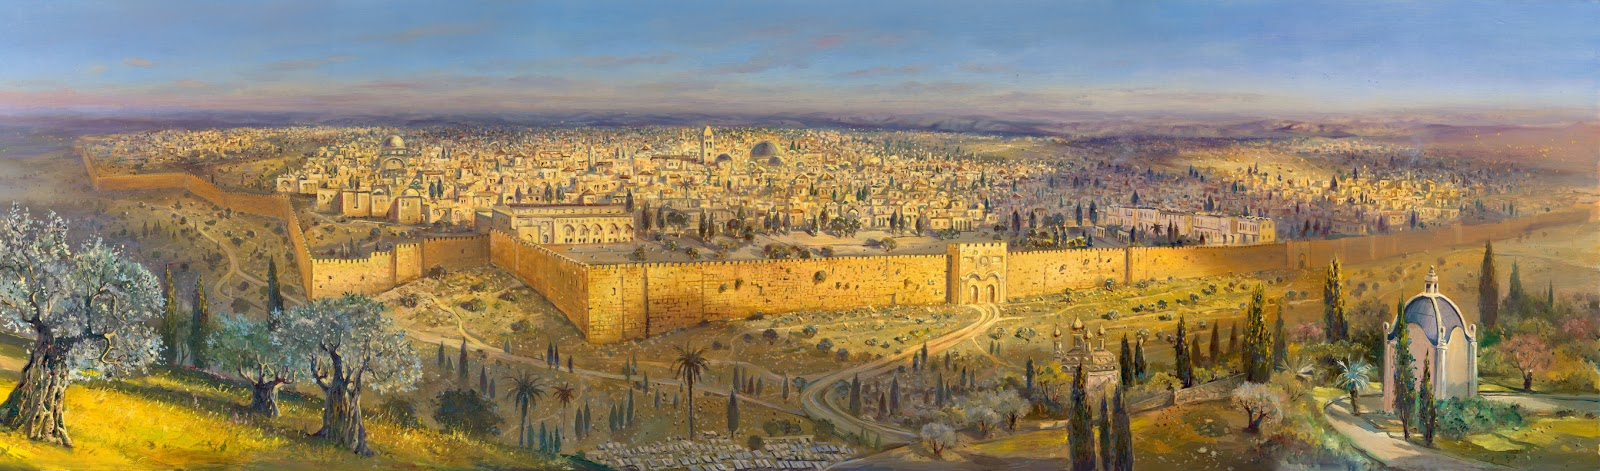 Alex Levin - Pinturas da cidade de Jerusalém